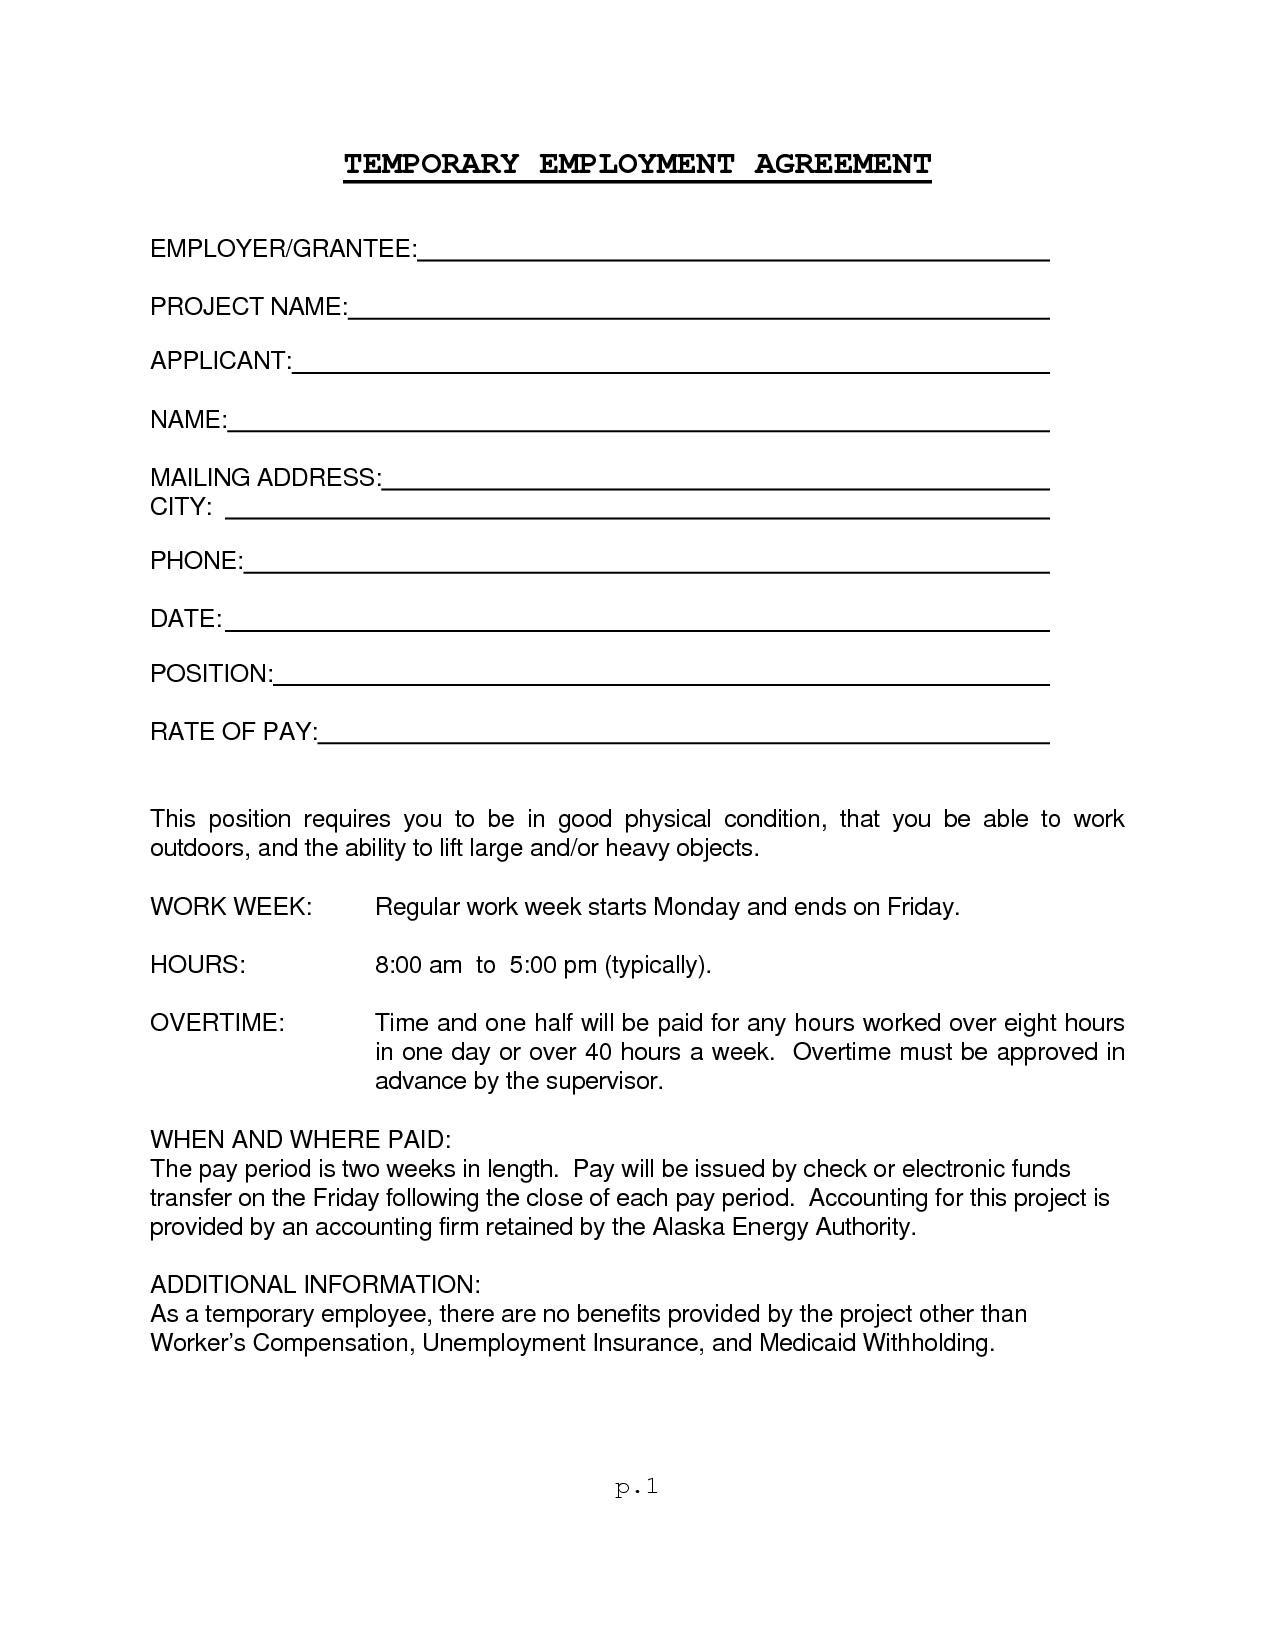 Employee Work Contract Template